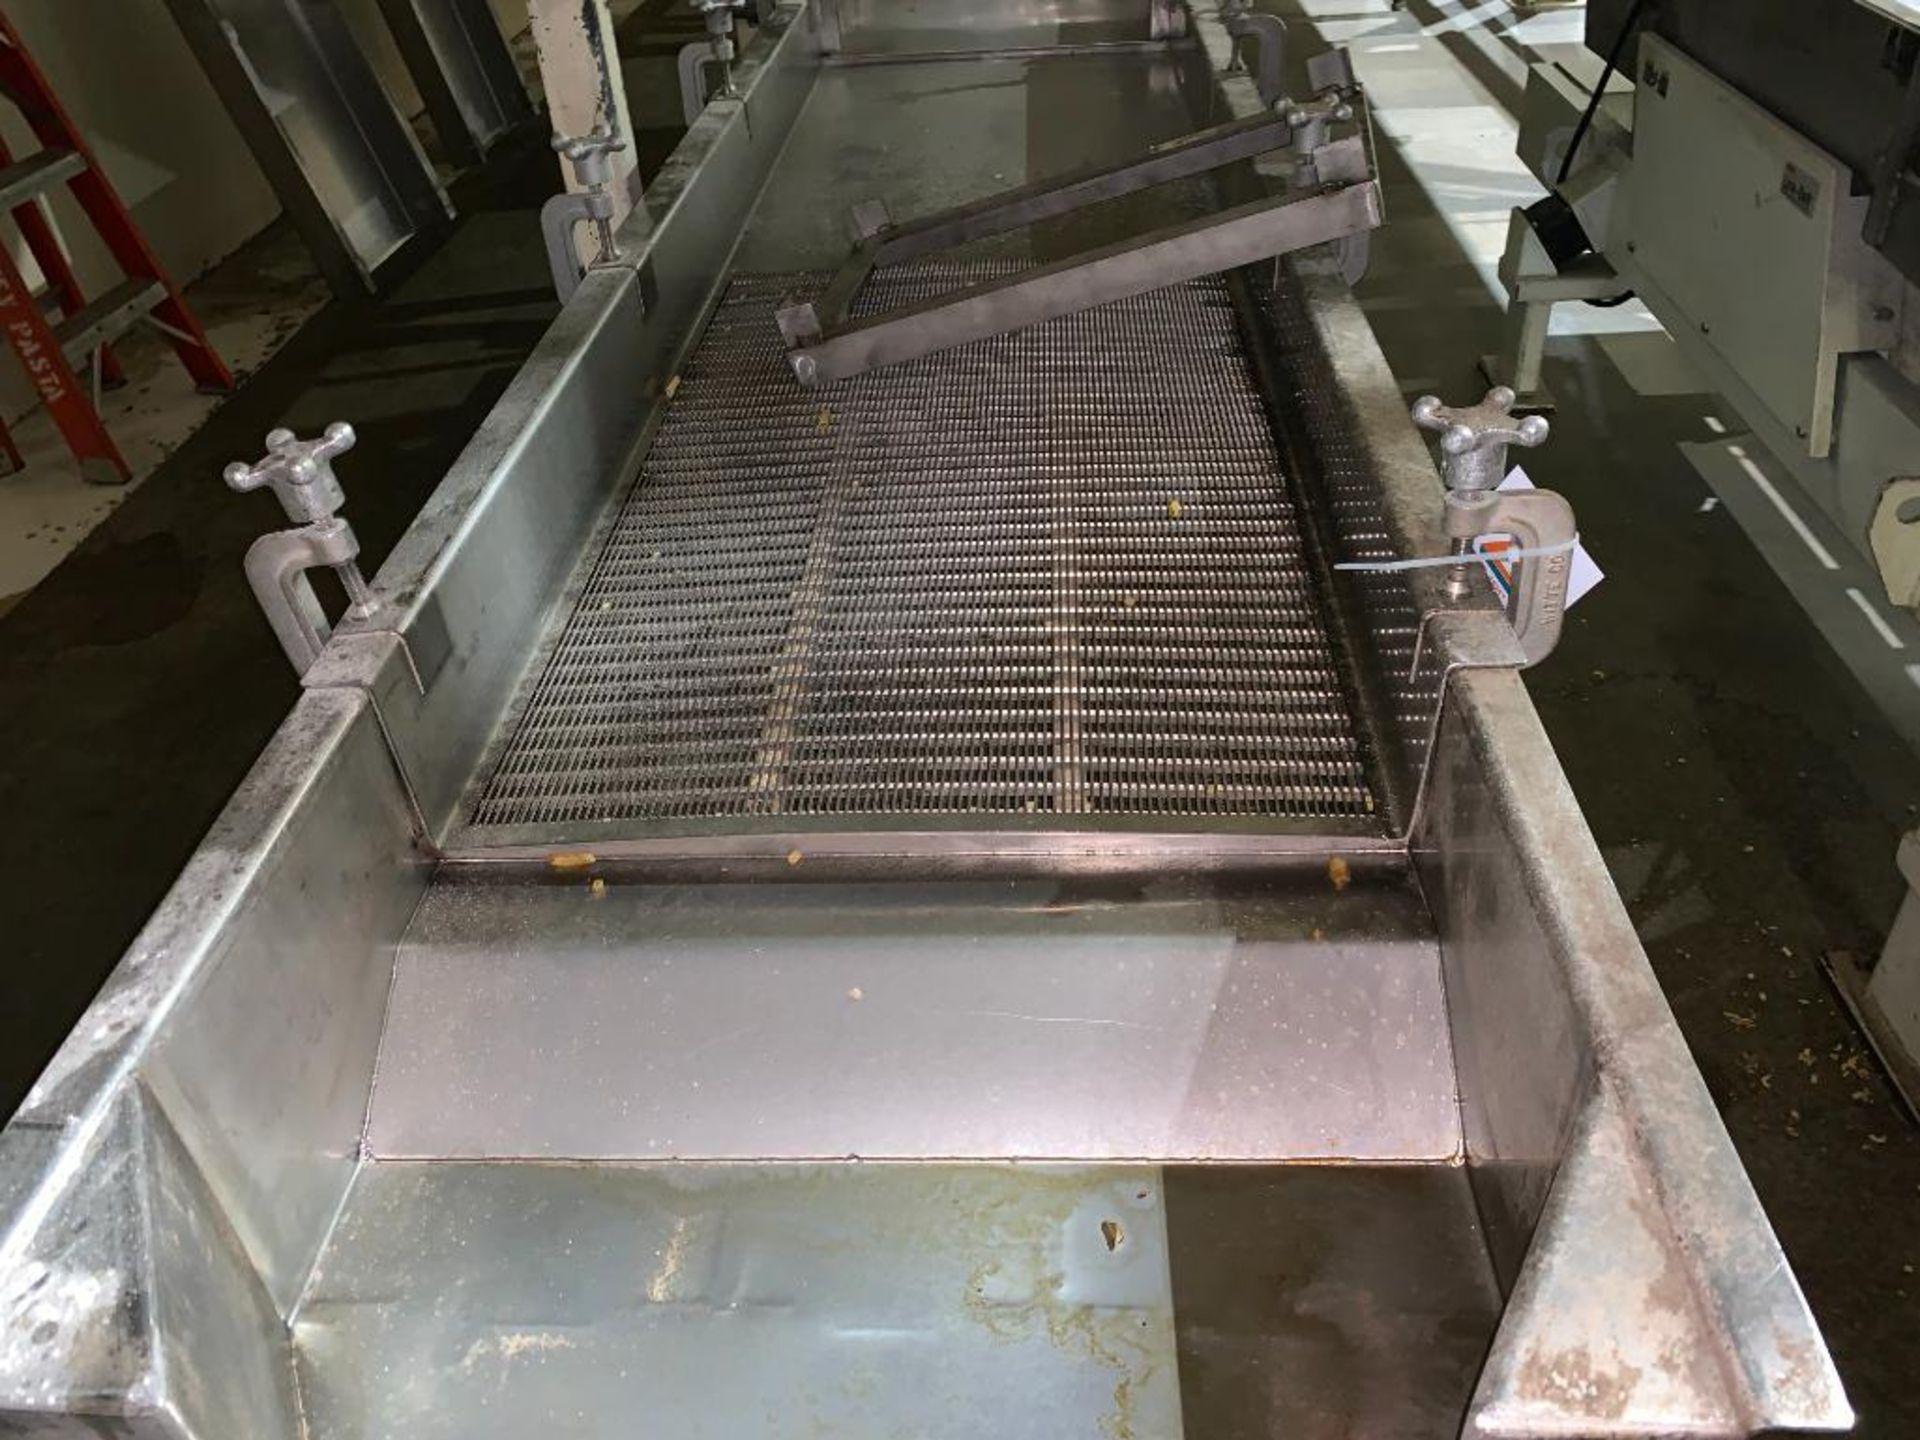 1993 Link-Belt stainless steel vibratory scalping conveyor - Image 9 of 10